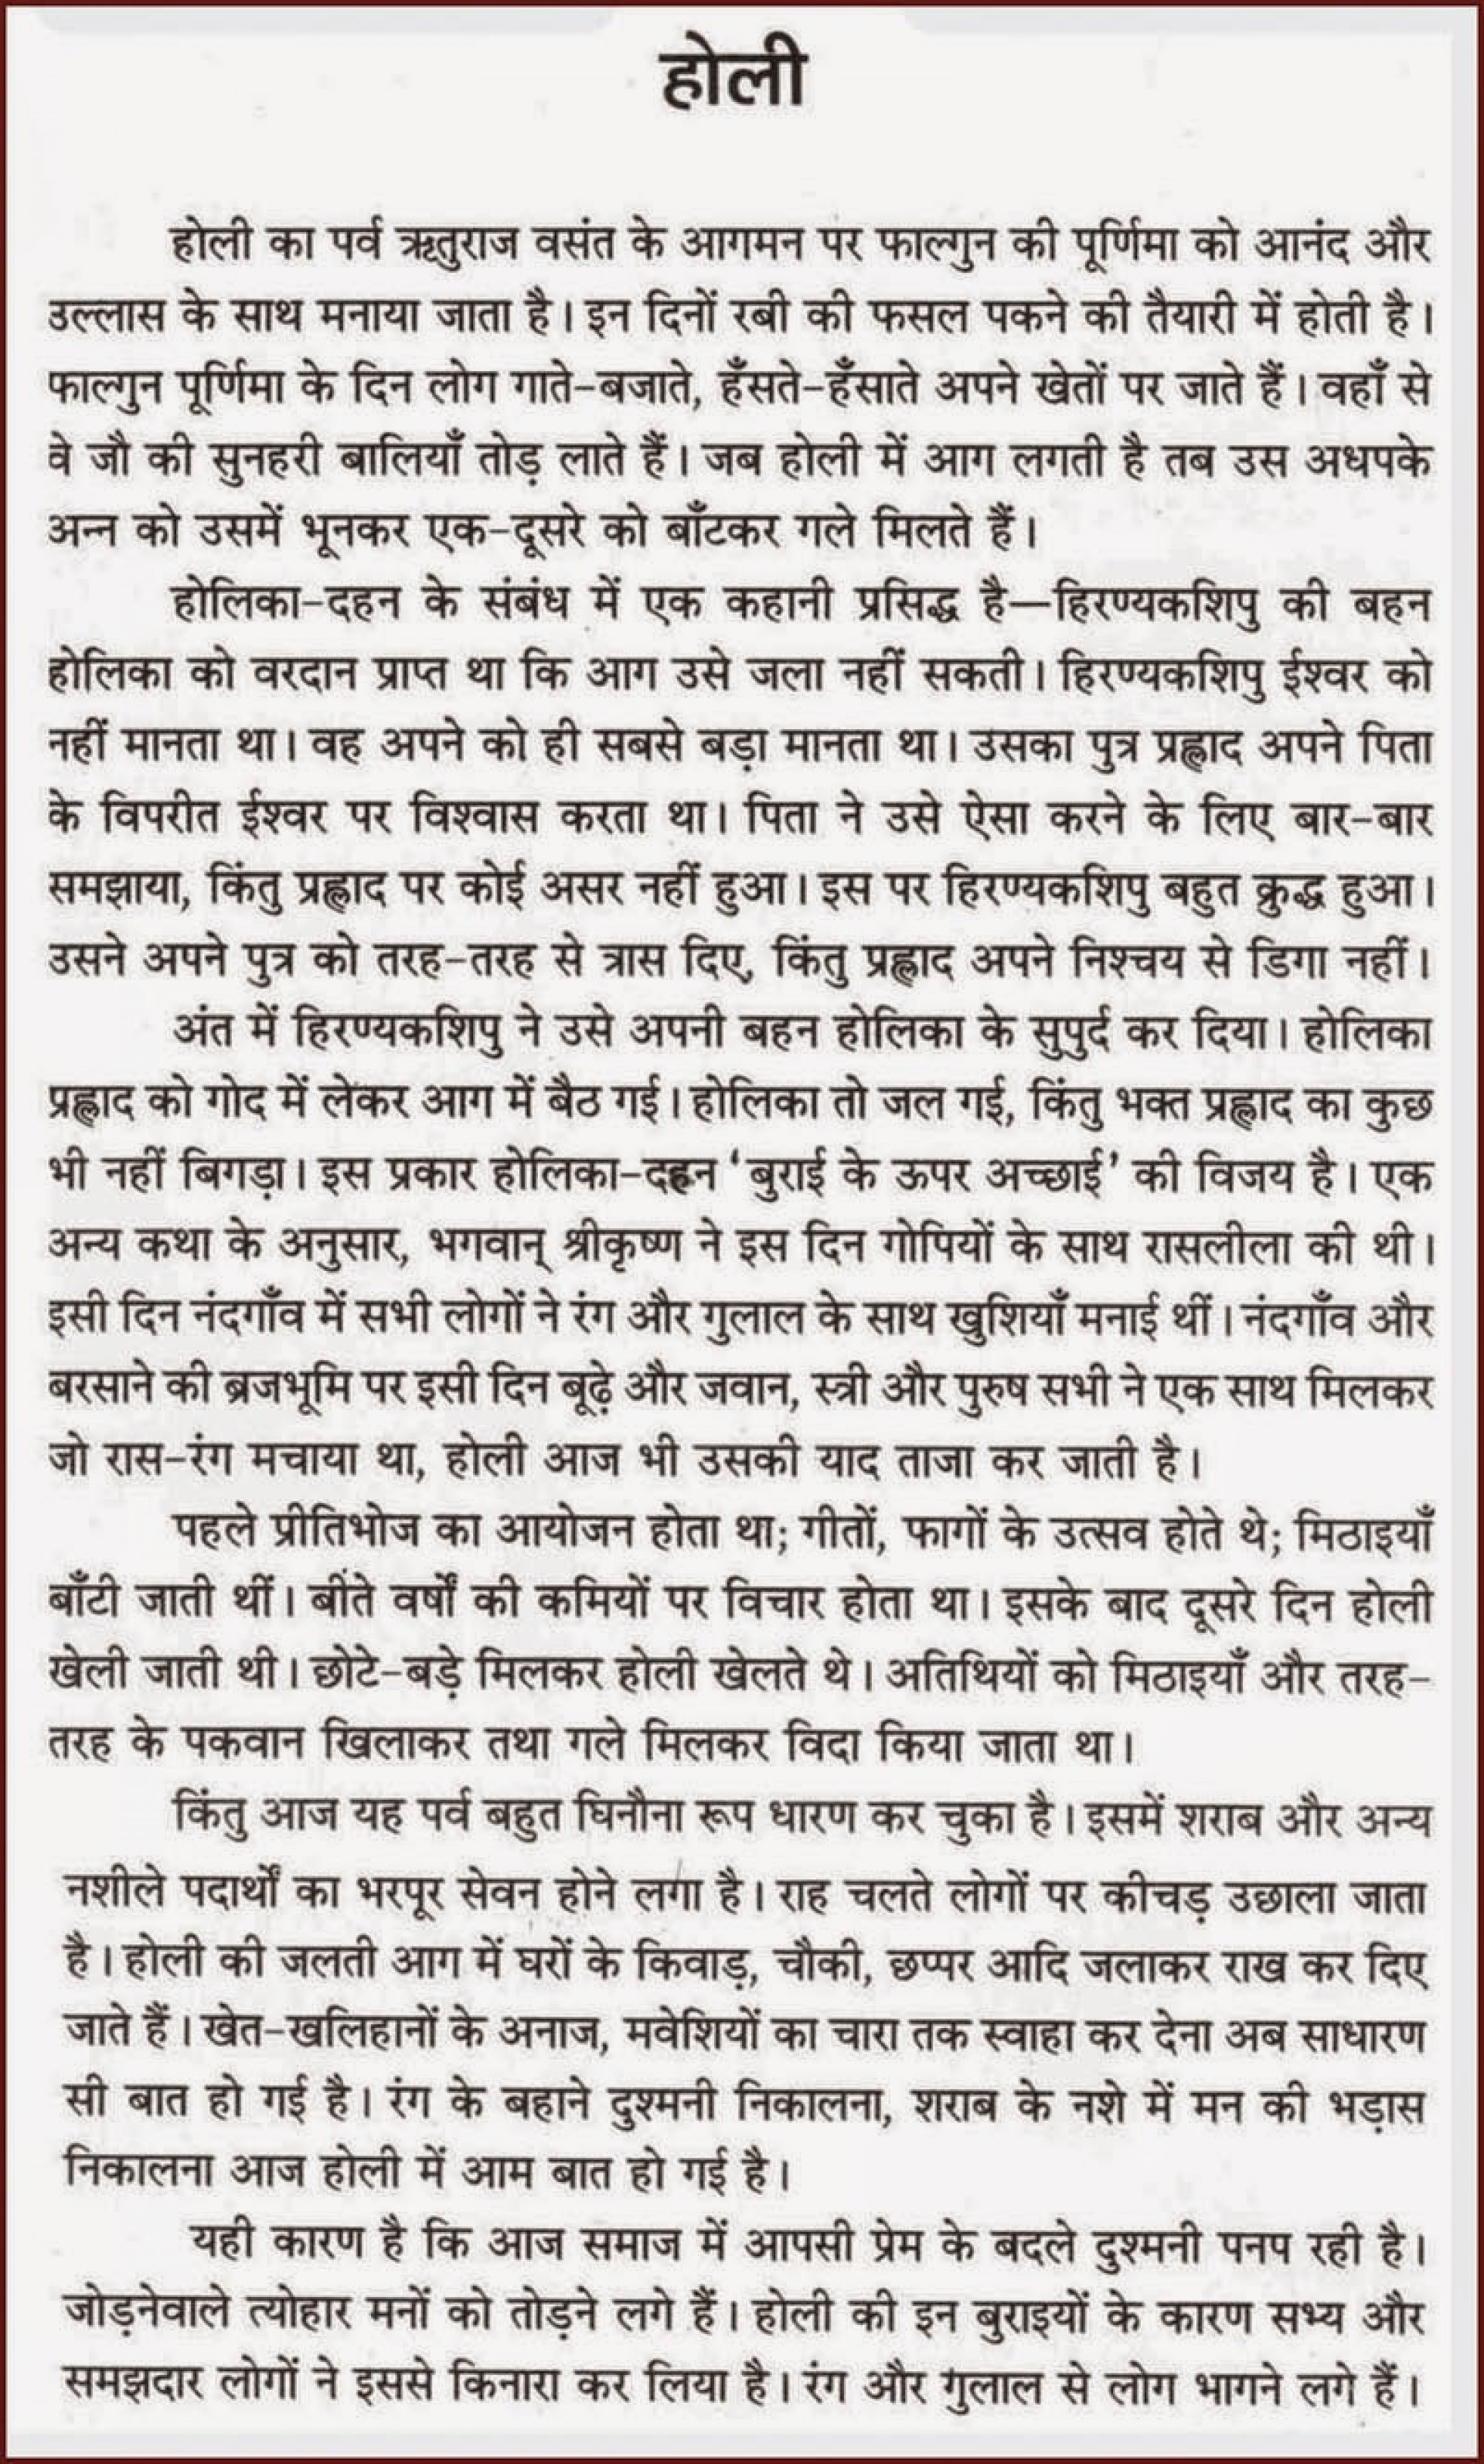 012 Essay Example Happy Holi Hindi Download Impressive On Holidays Are Necessary Evils In Gujarati Festival Punjabi Language 1920